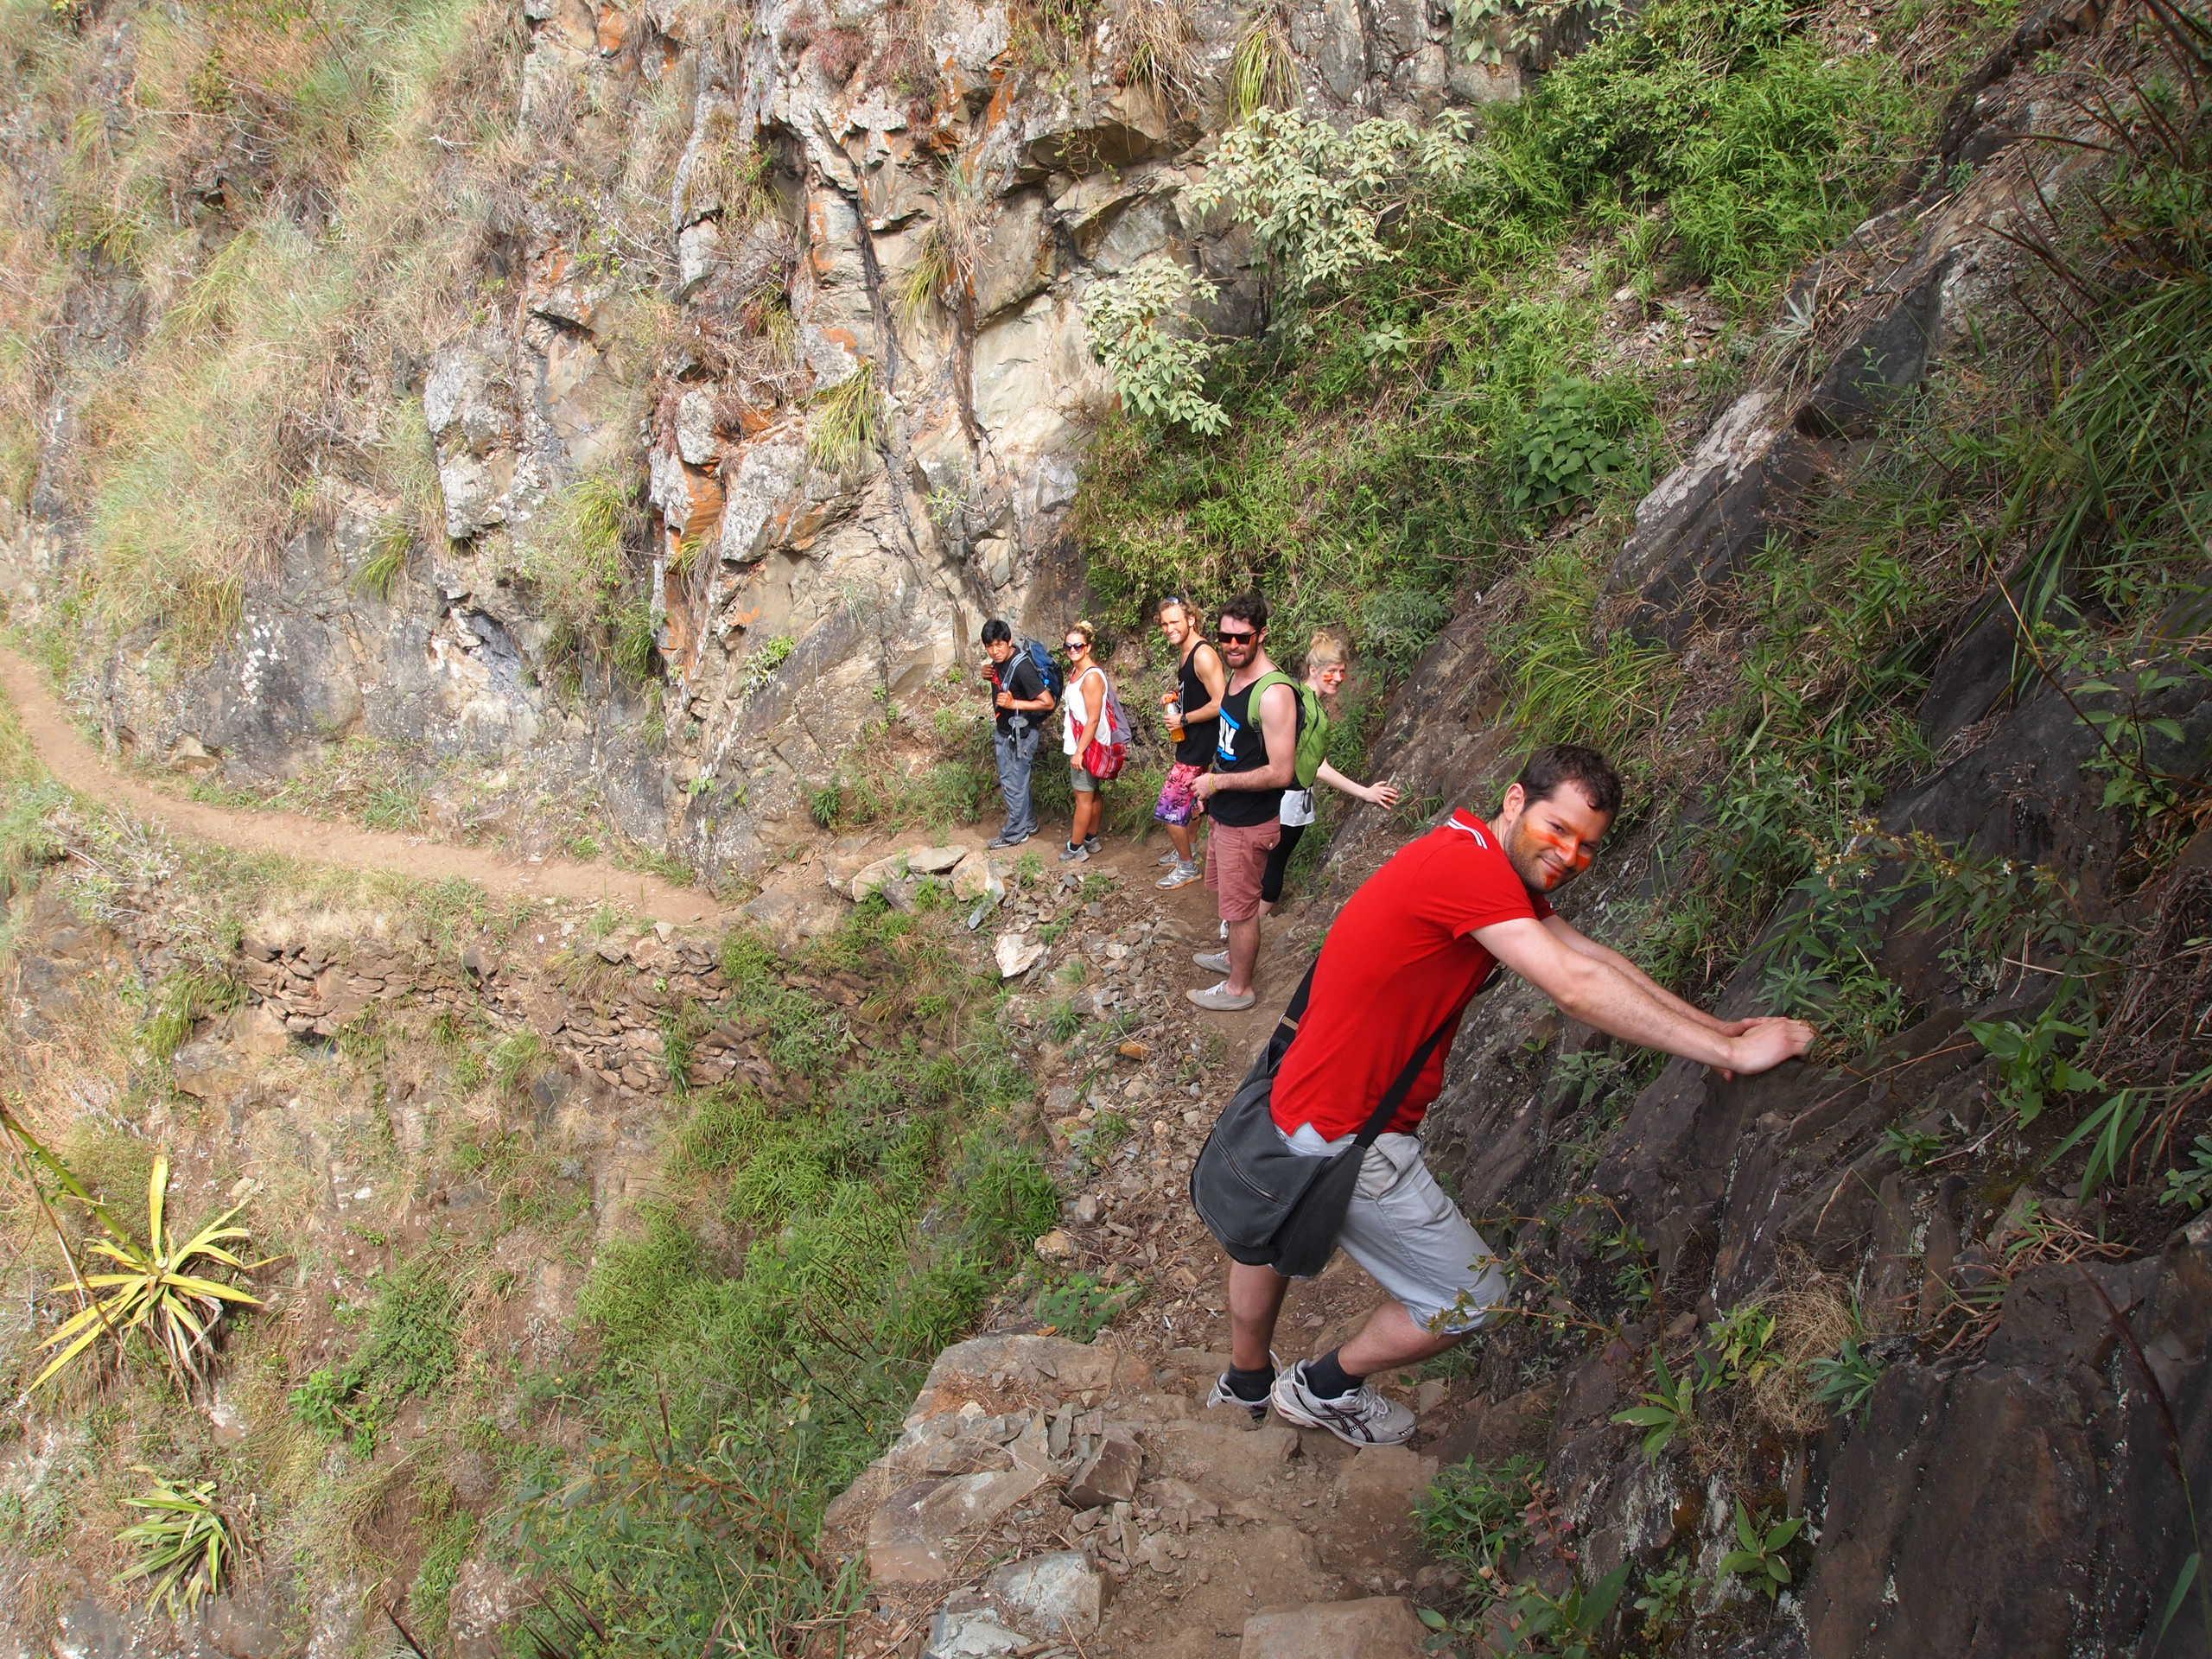 More steep, narrow trail...